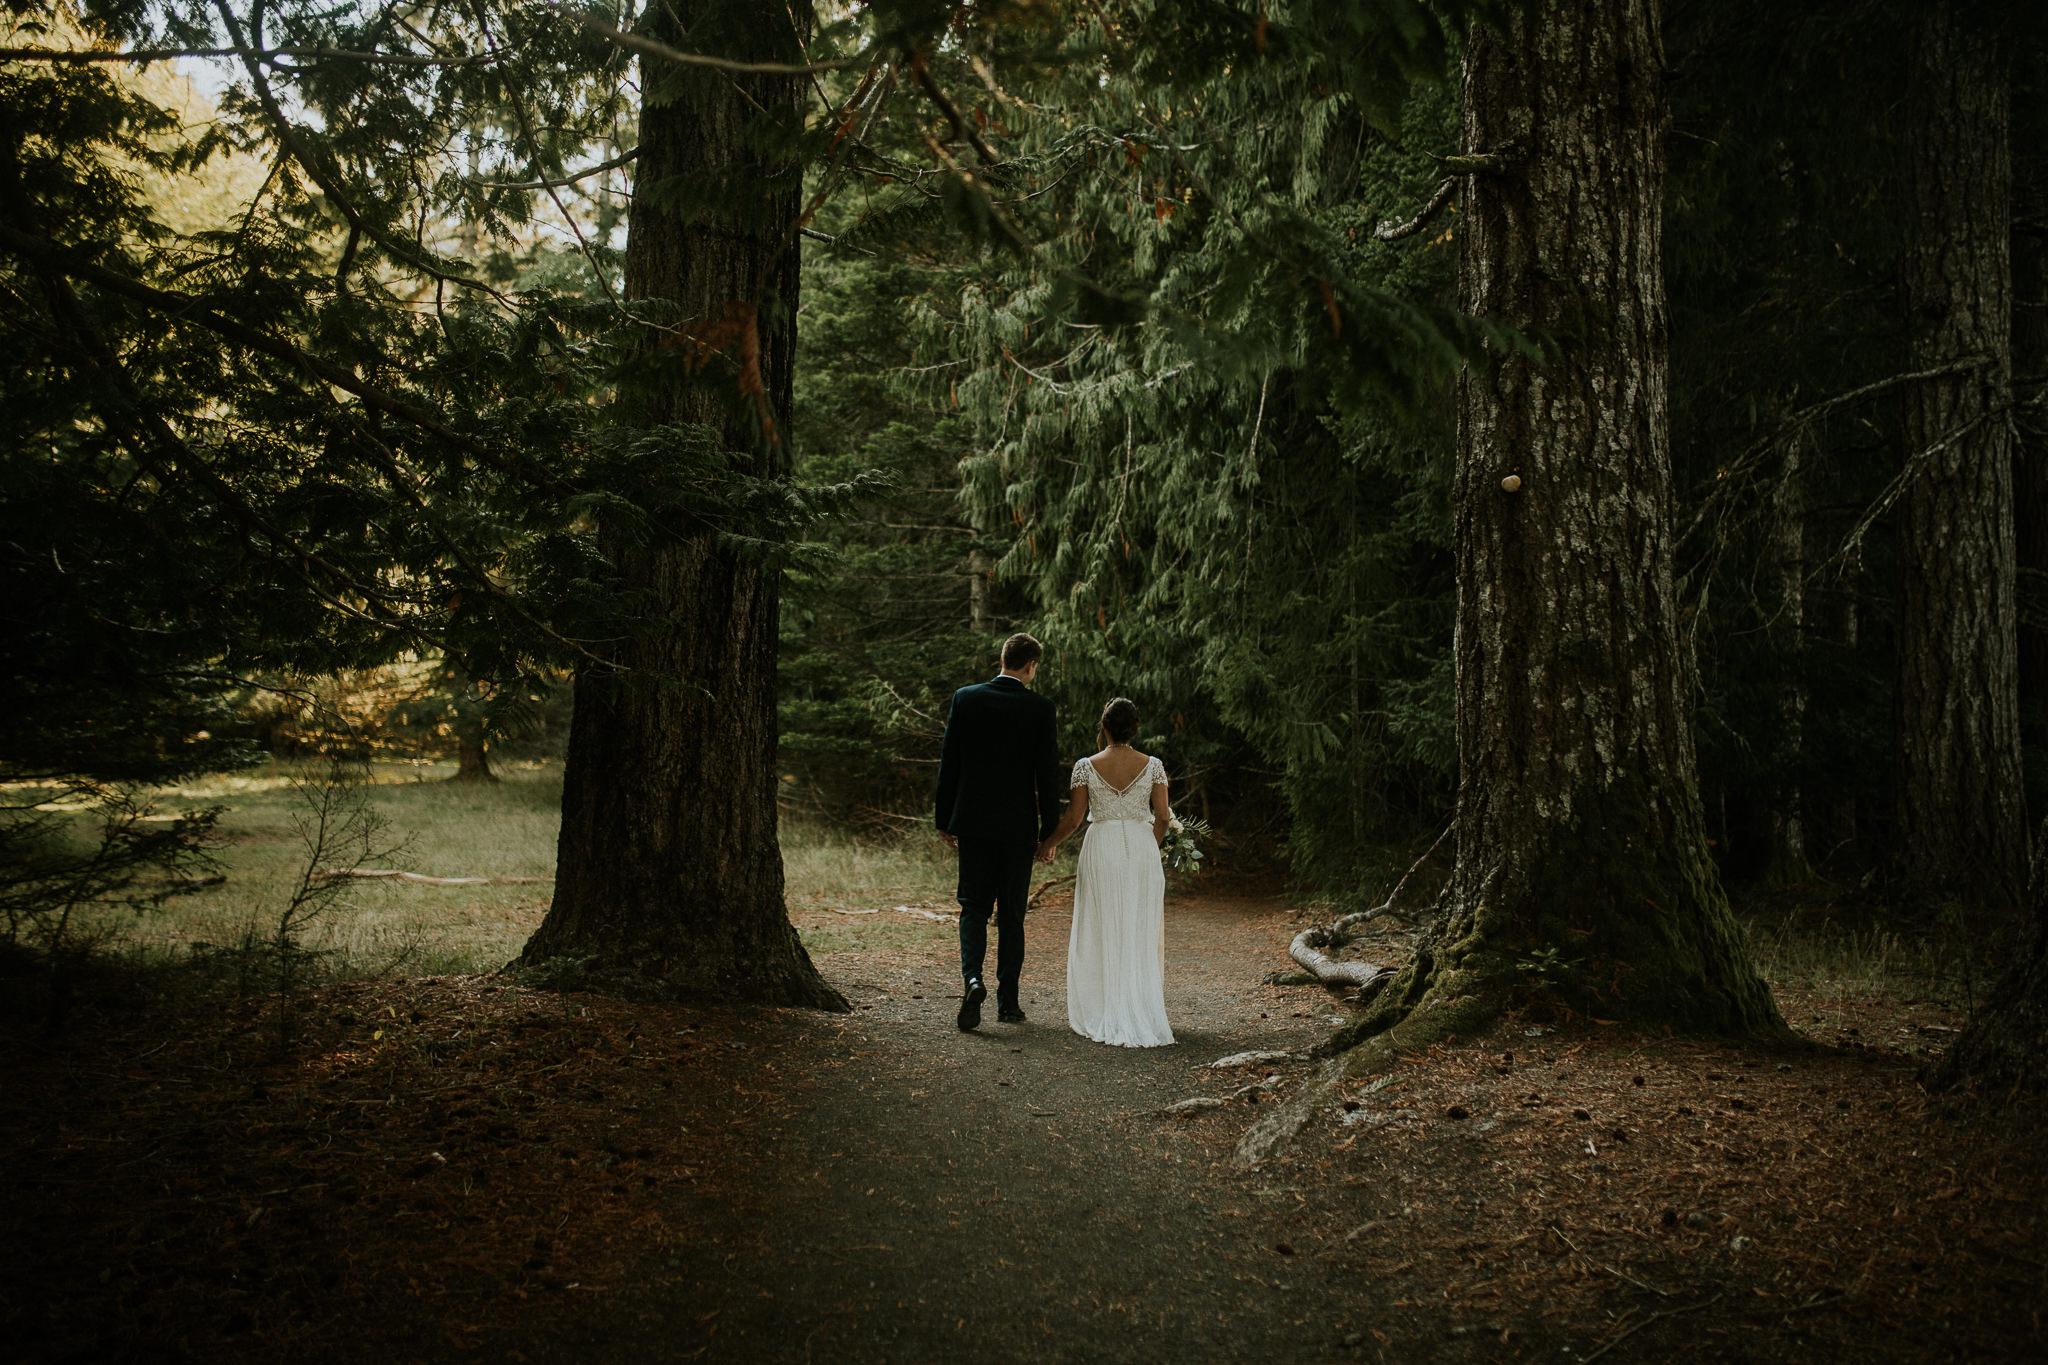 Cresent-lake-elopement-BreeAnna-Lasher-16.jpg